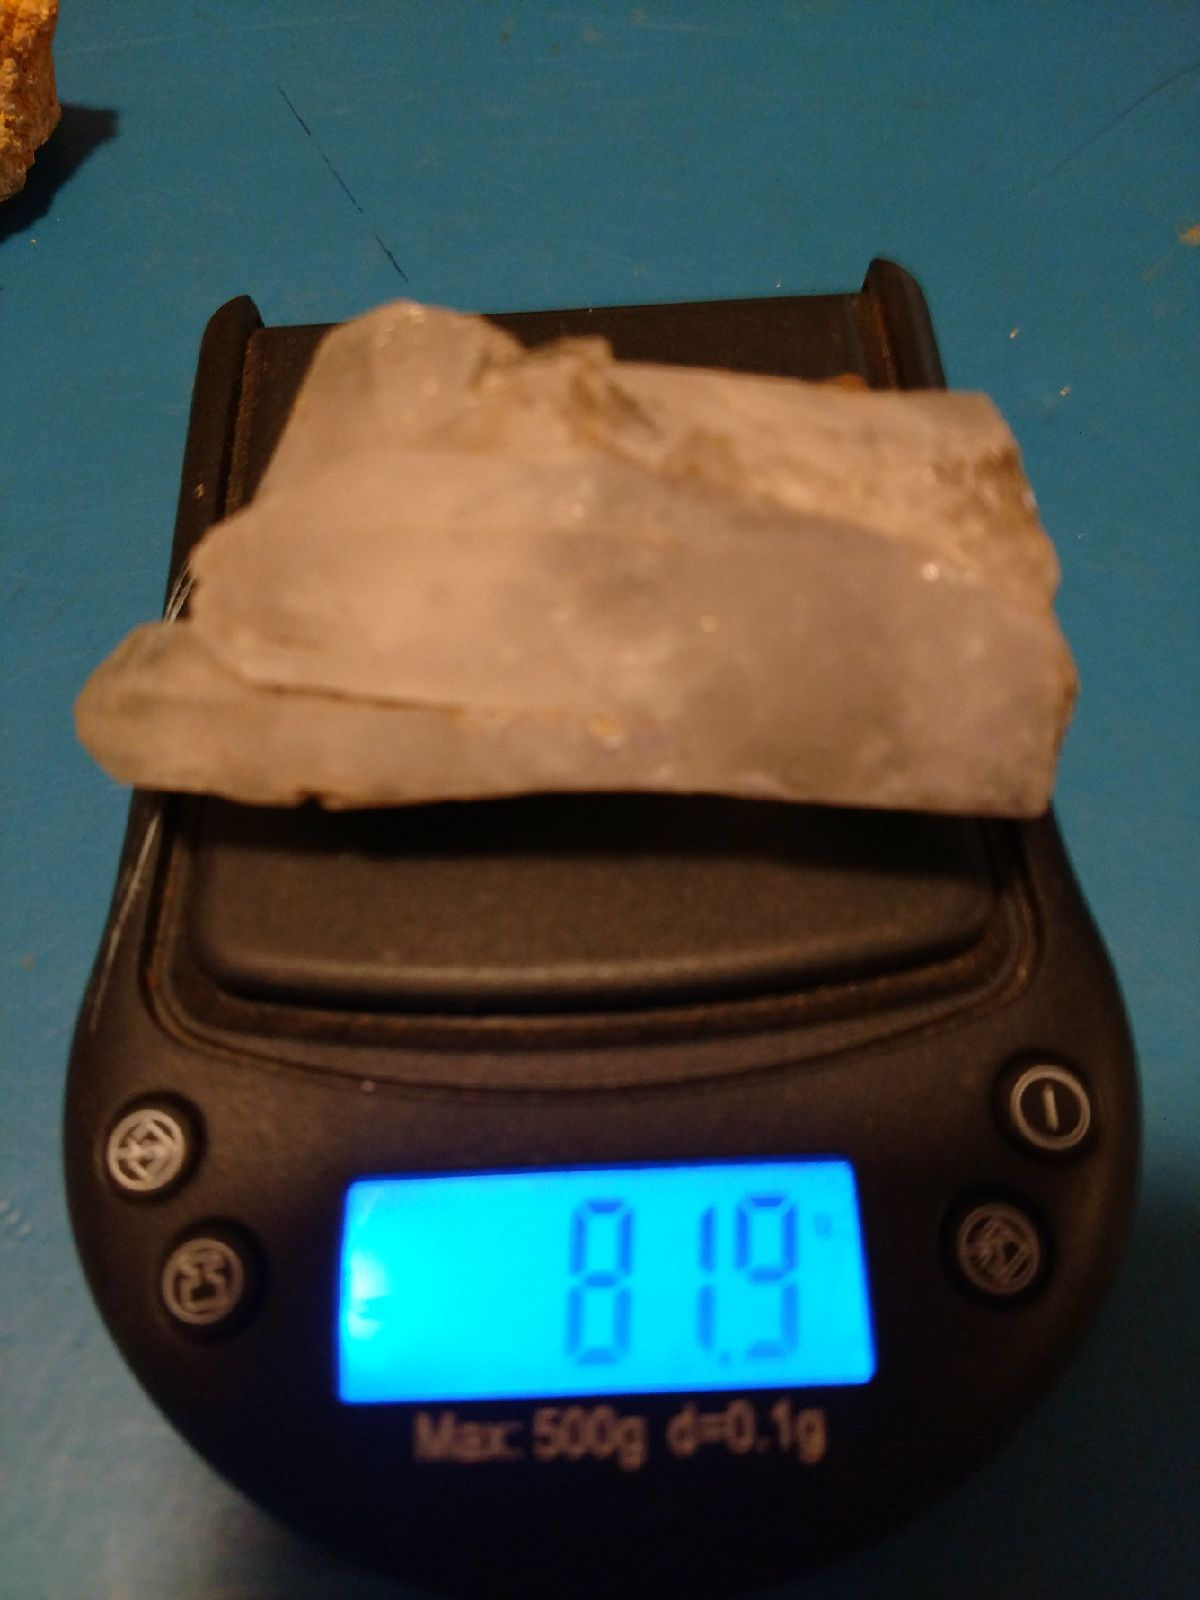 Clear quartz 82 g phantom crystal clear quartz crystals